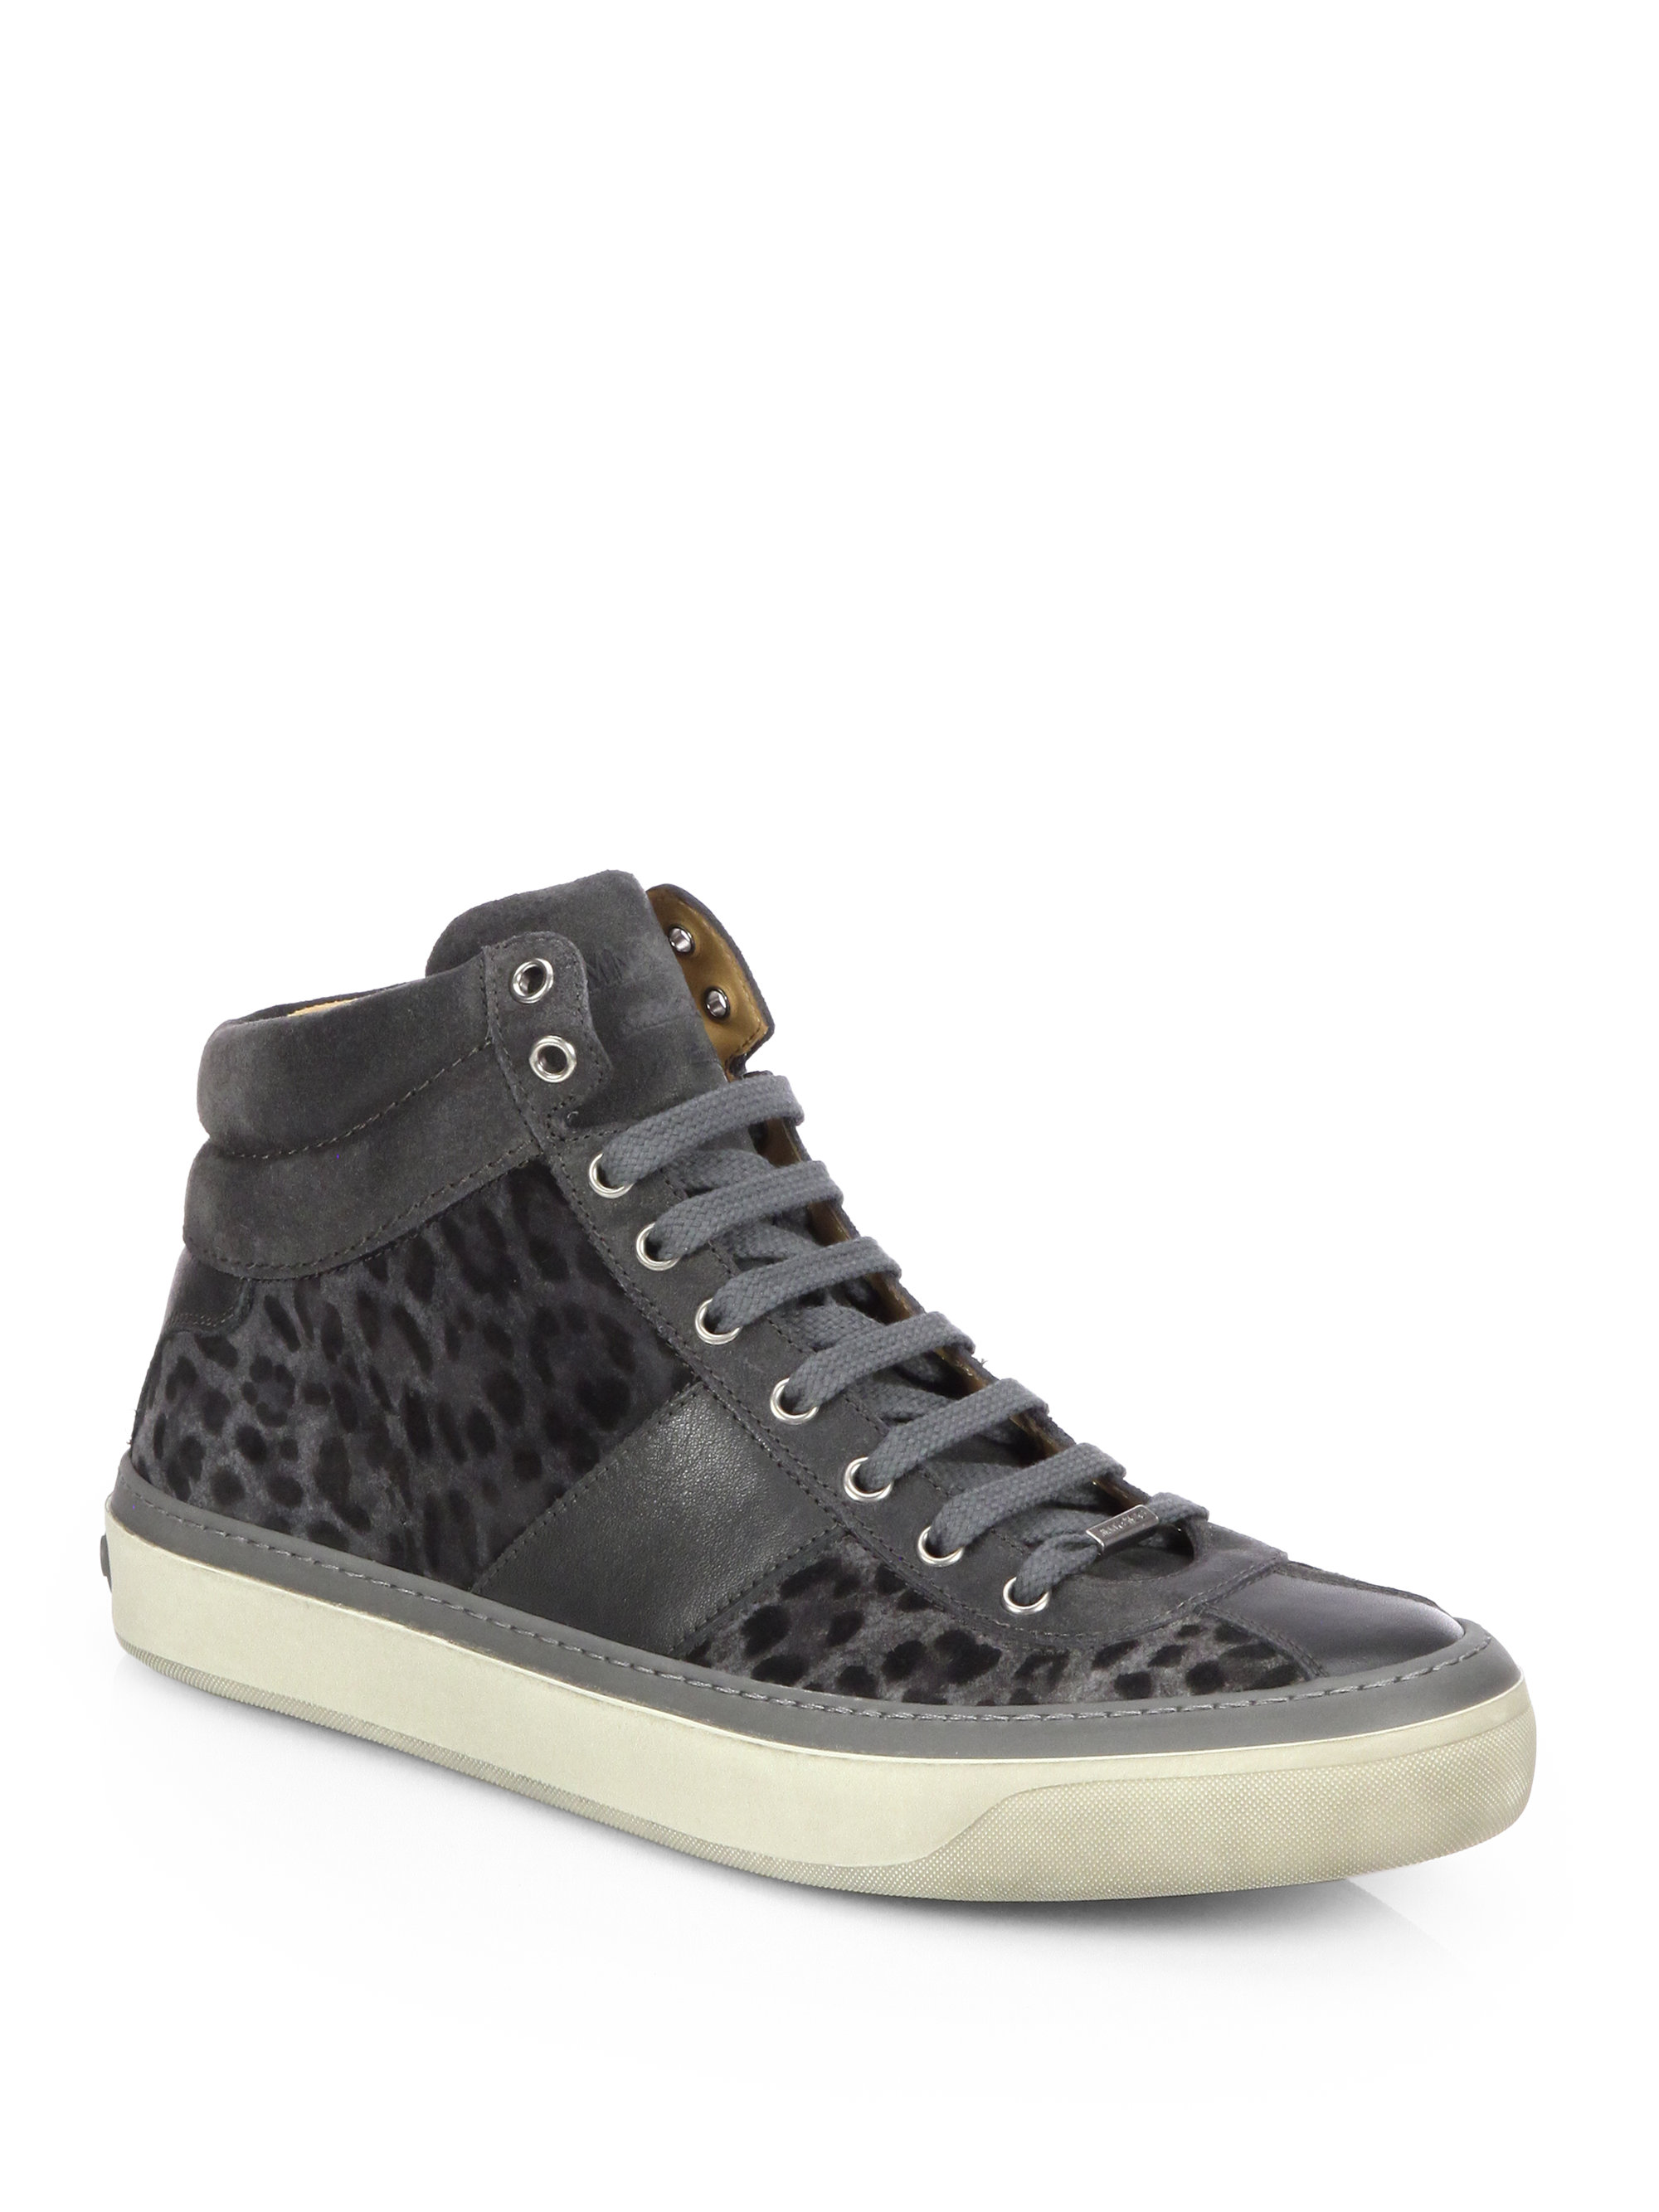 jimmy choo belgravi leopard print hightop sneakers in gray for men lyst. Black Bedroom Furniture Sets. Home Design Ideas